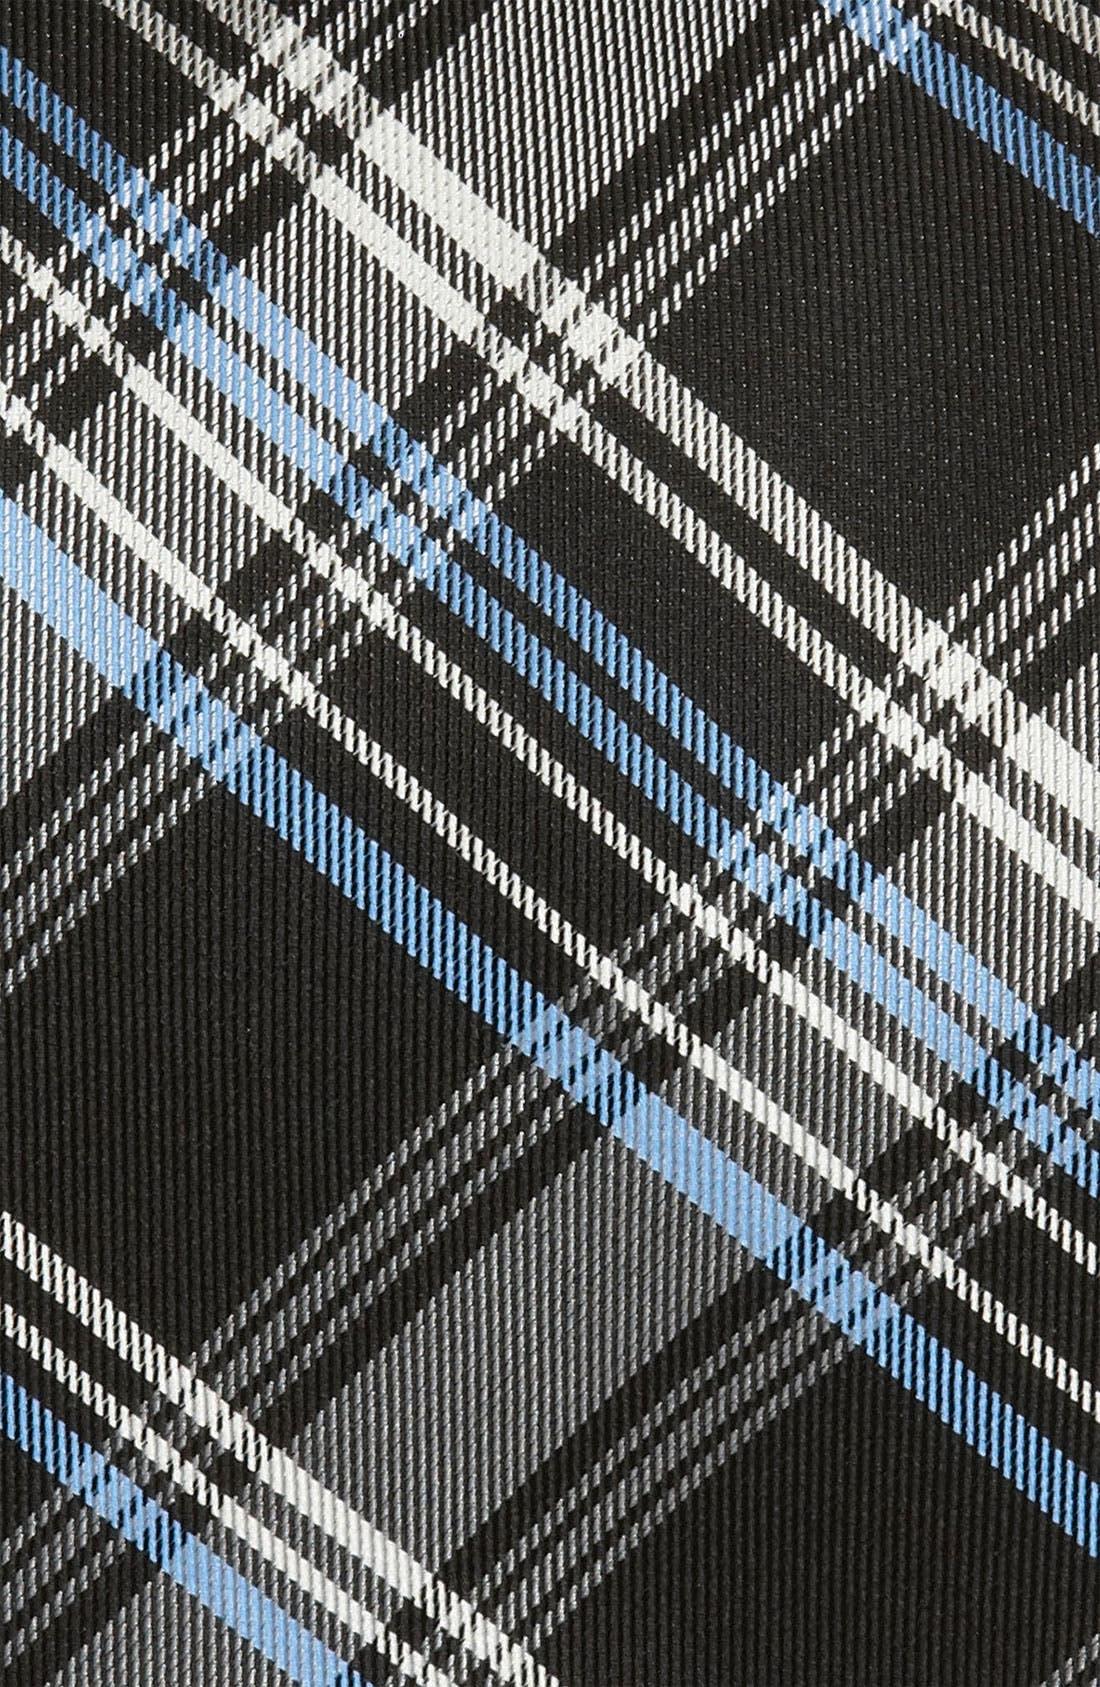 Nordstrom Woven Silk Tie,                             Alternate thumbnail 2, color,                             001